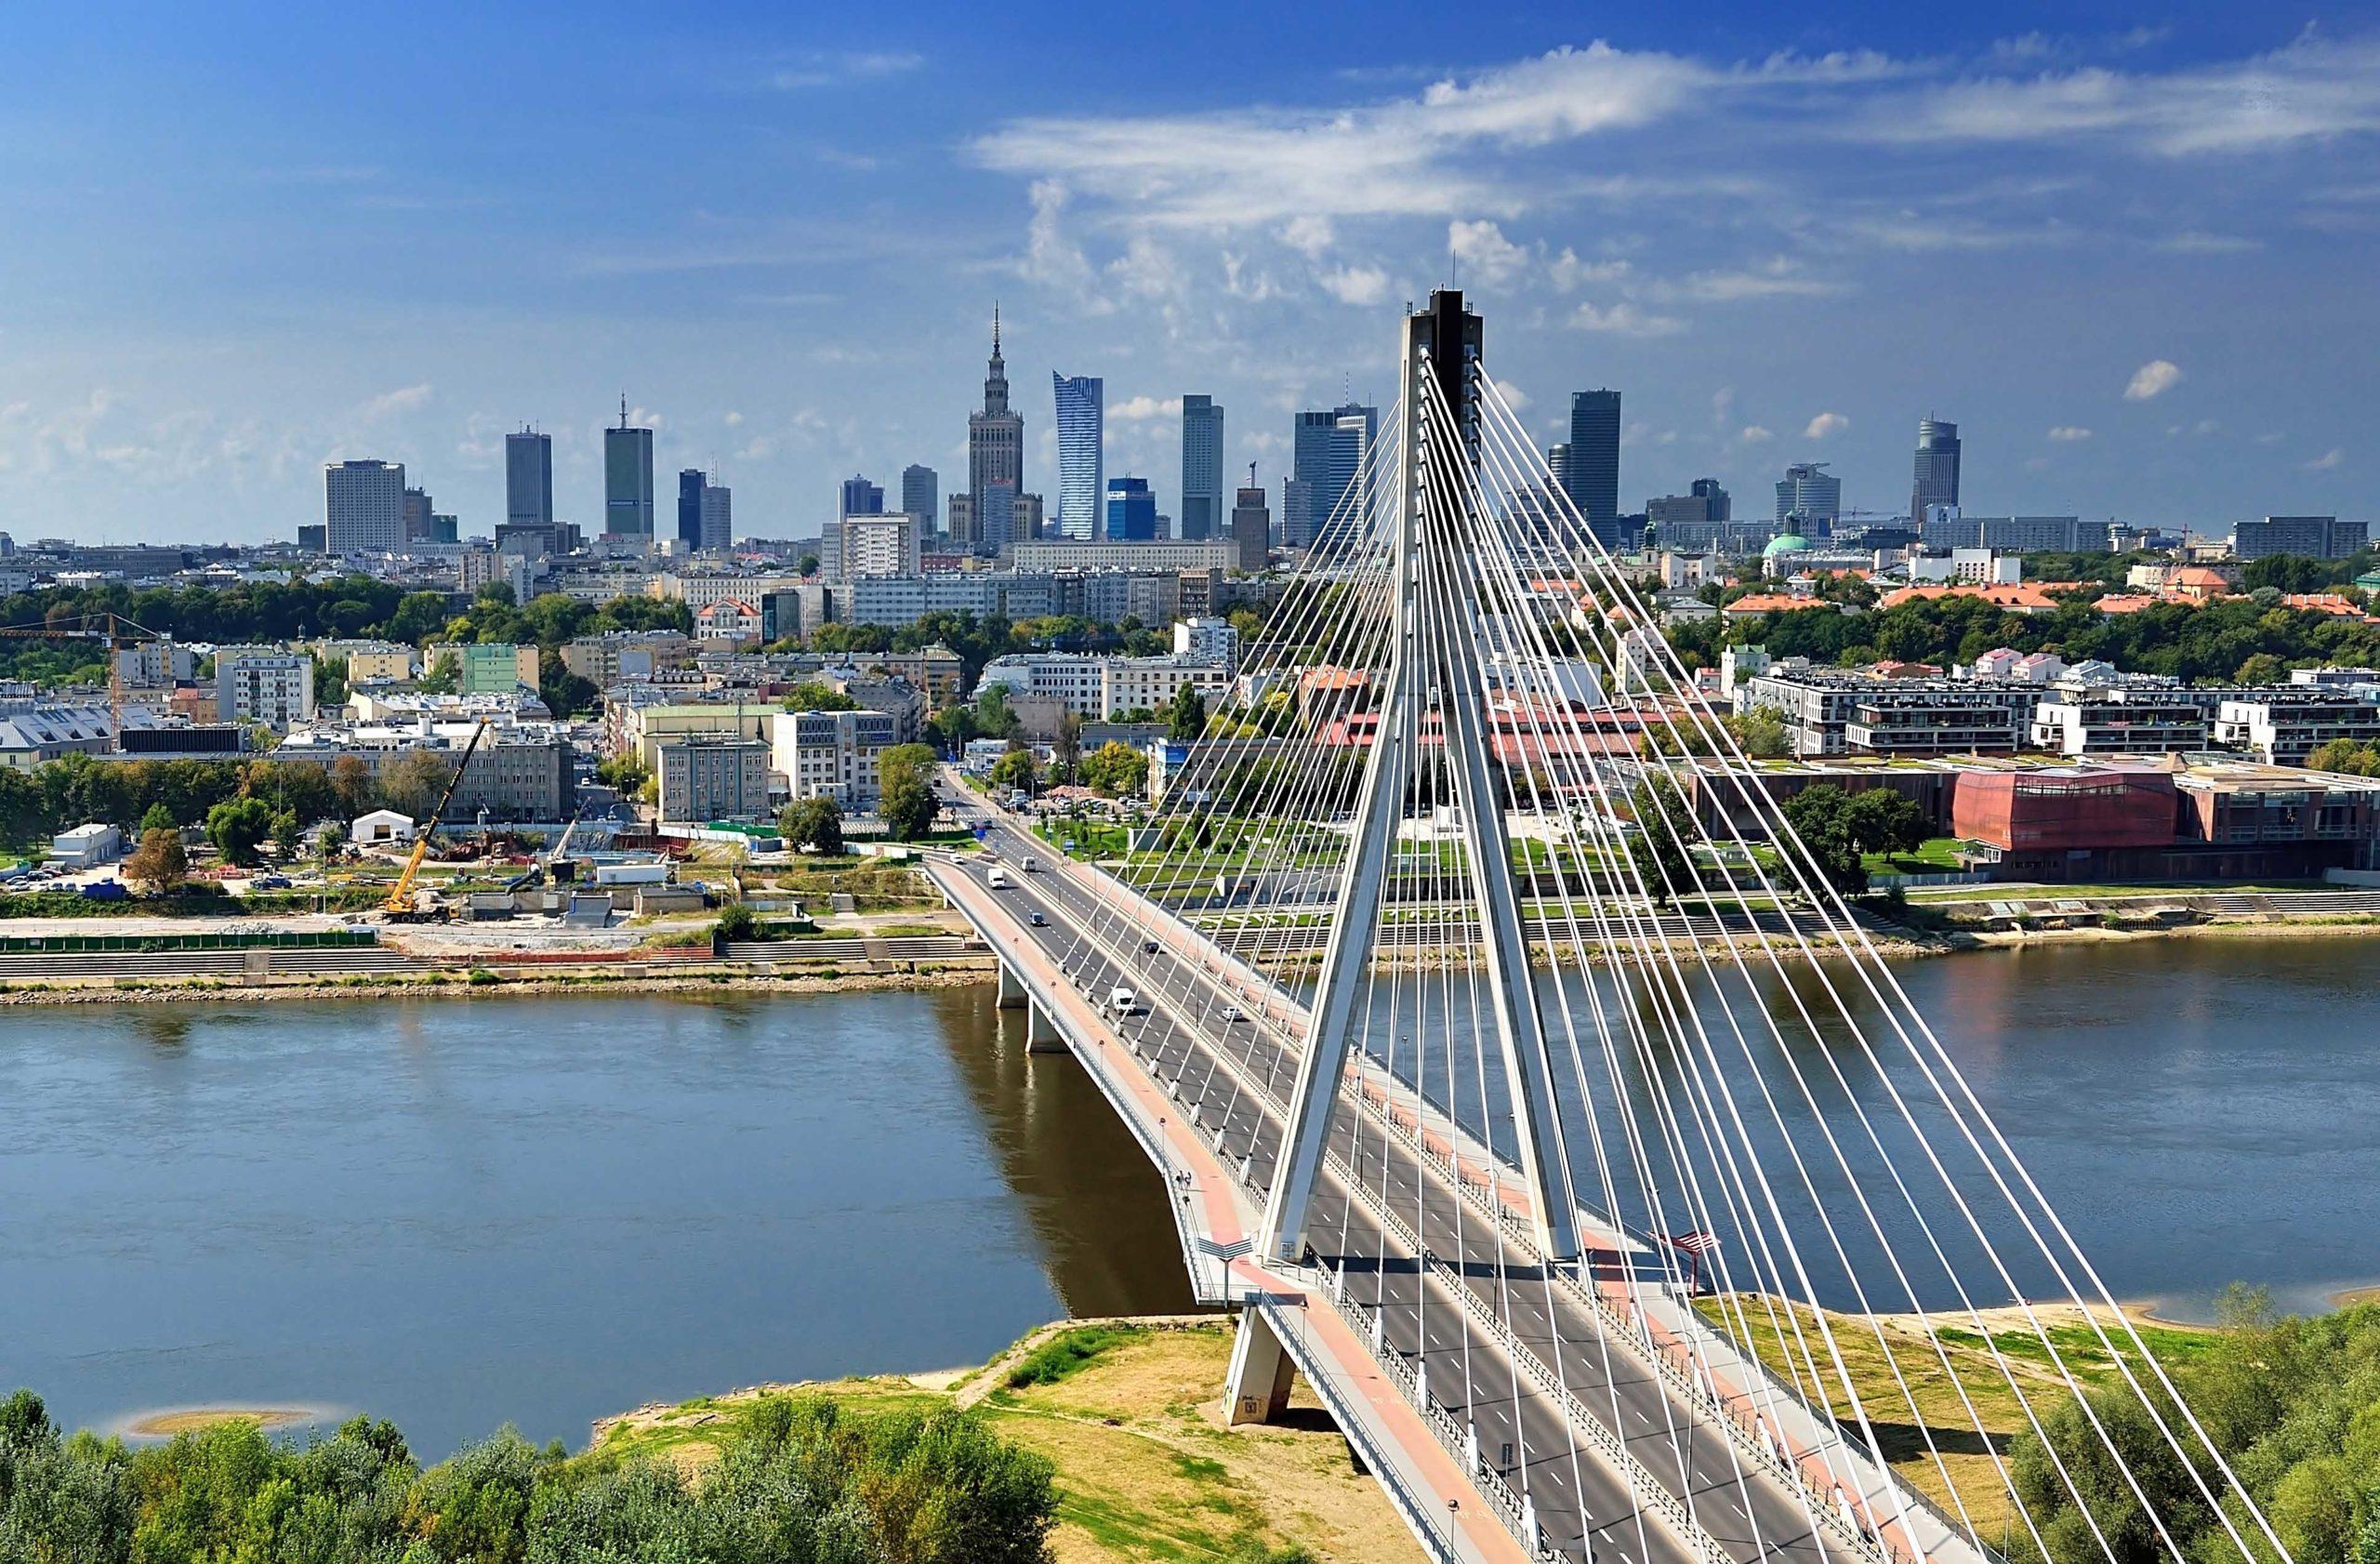 Warsaw - bird's-eye view.